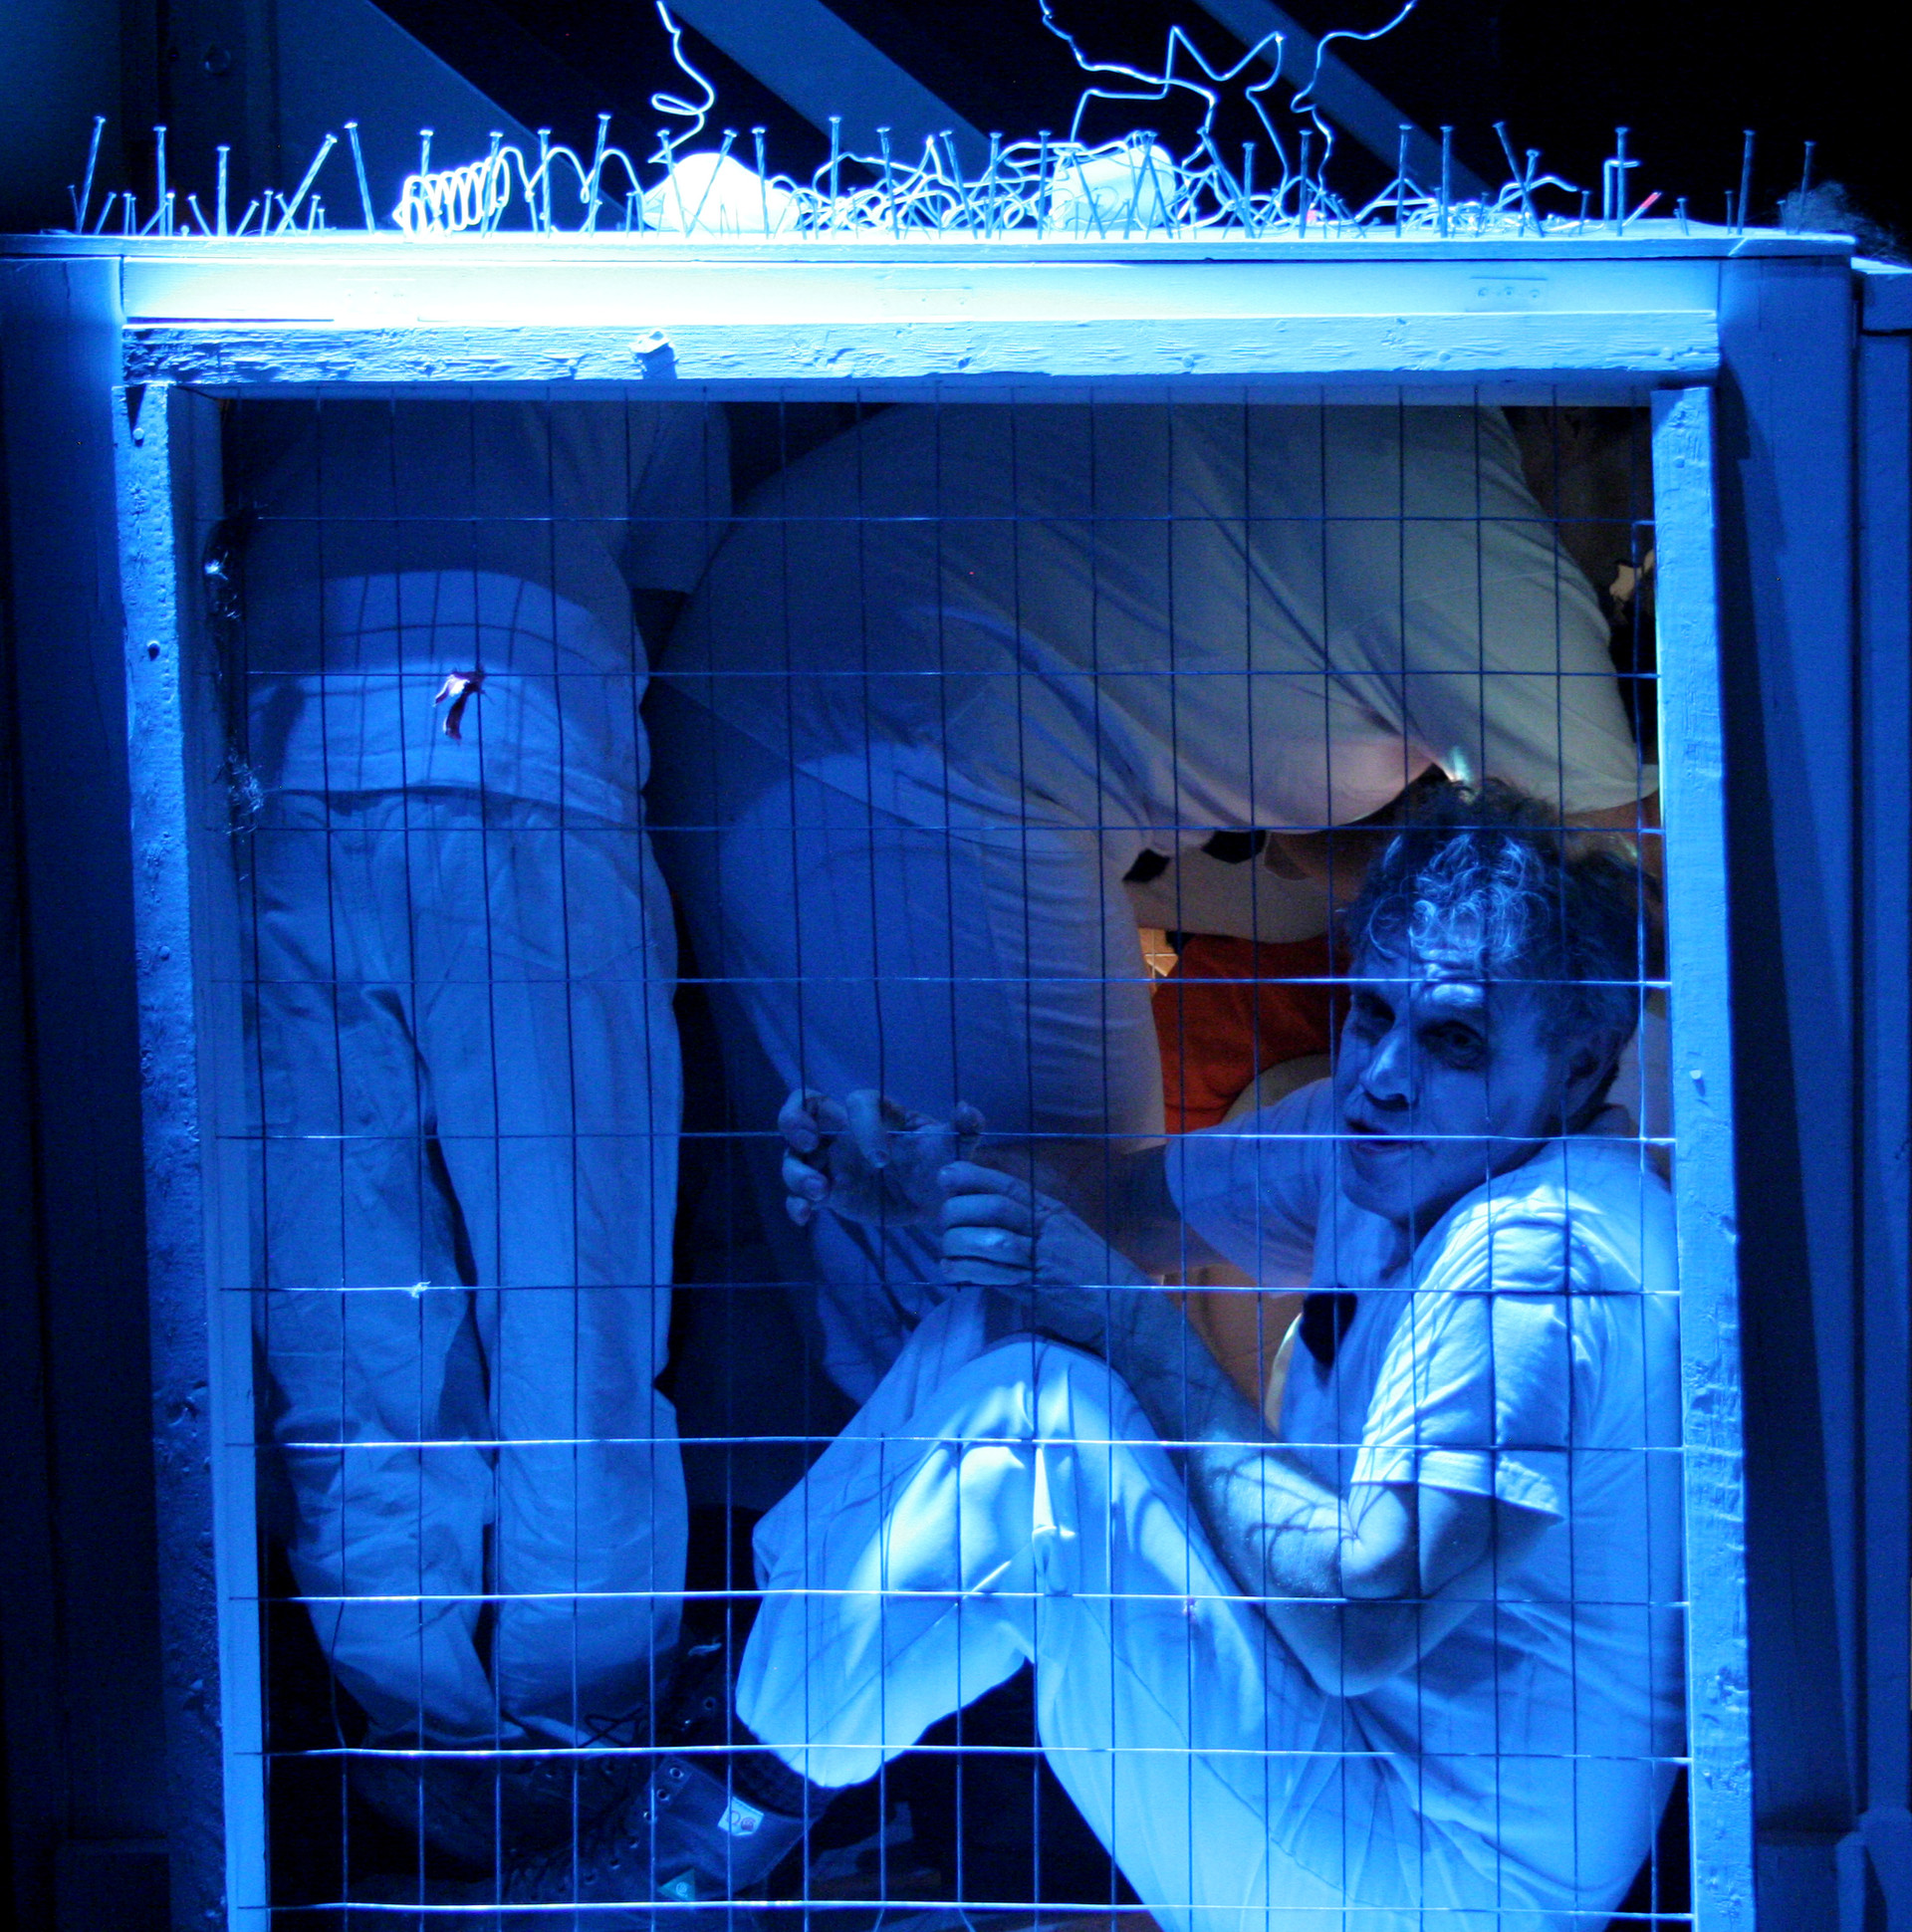 Death Clowns in Guantanamo Bay